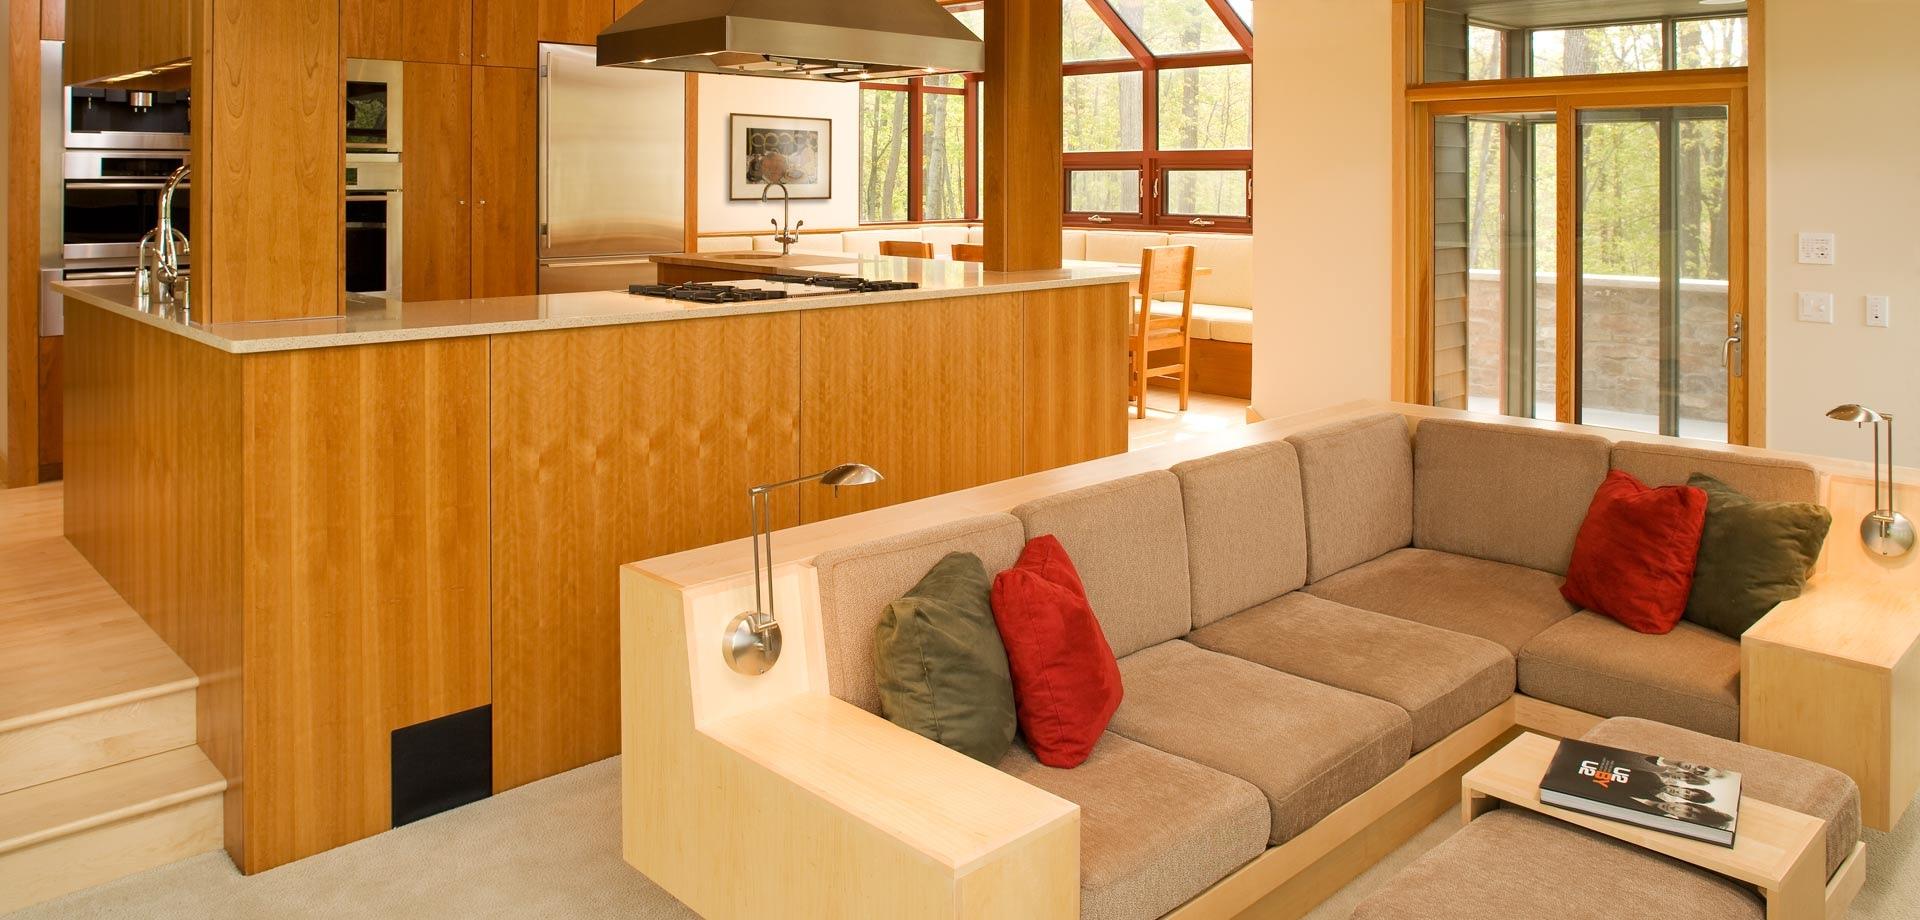 small living room photos coastal furniture ideas sala architects inc. | minneapolis stillwater